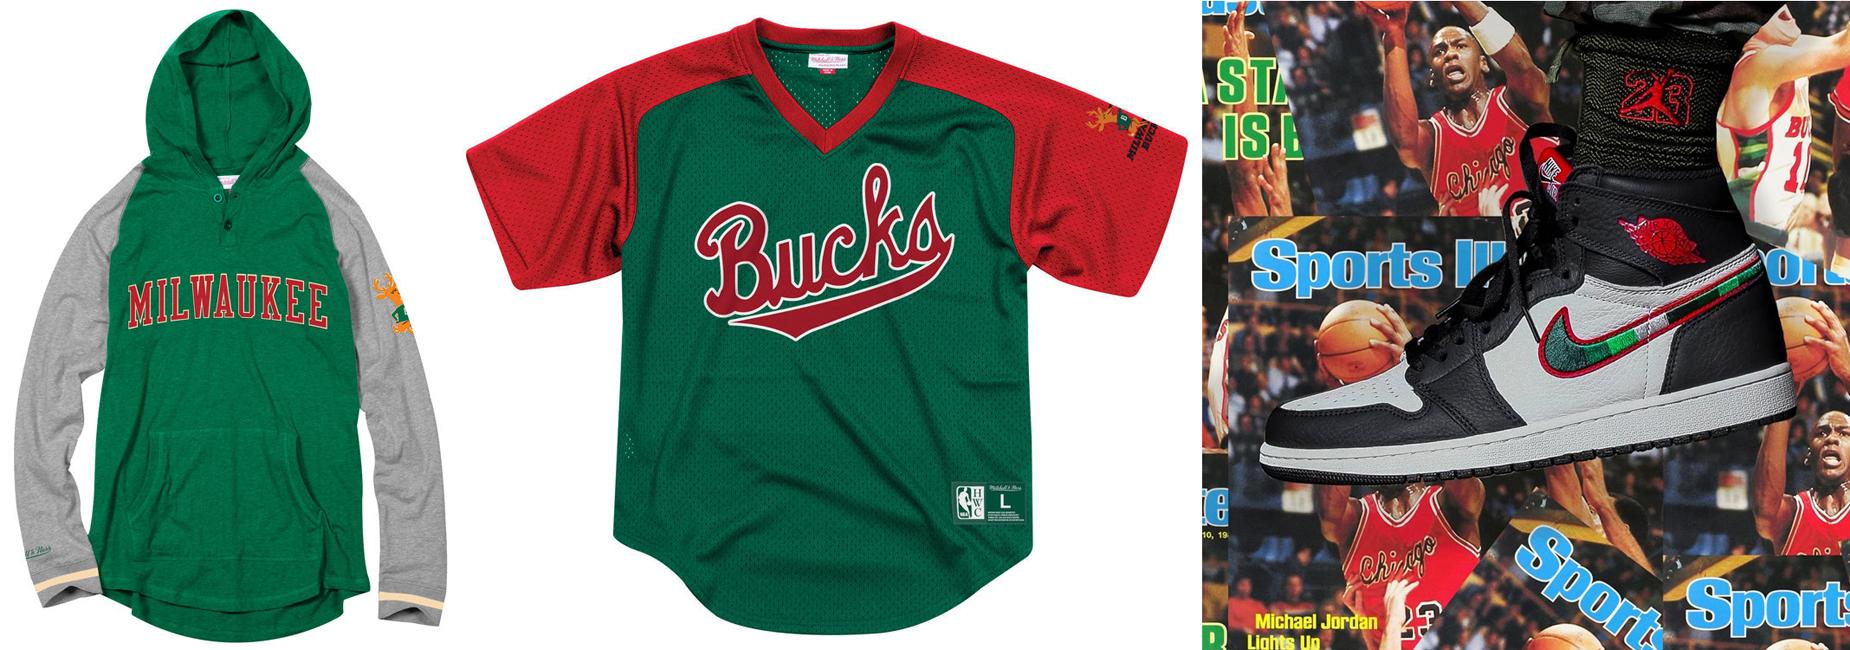 jordan-1-a-star-is-born-sports-illustrated-bucks-clothing-gear